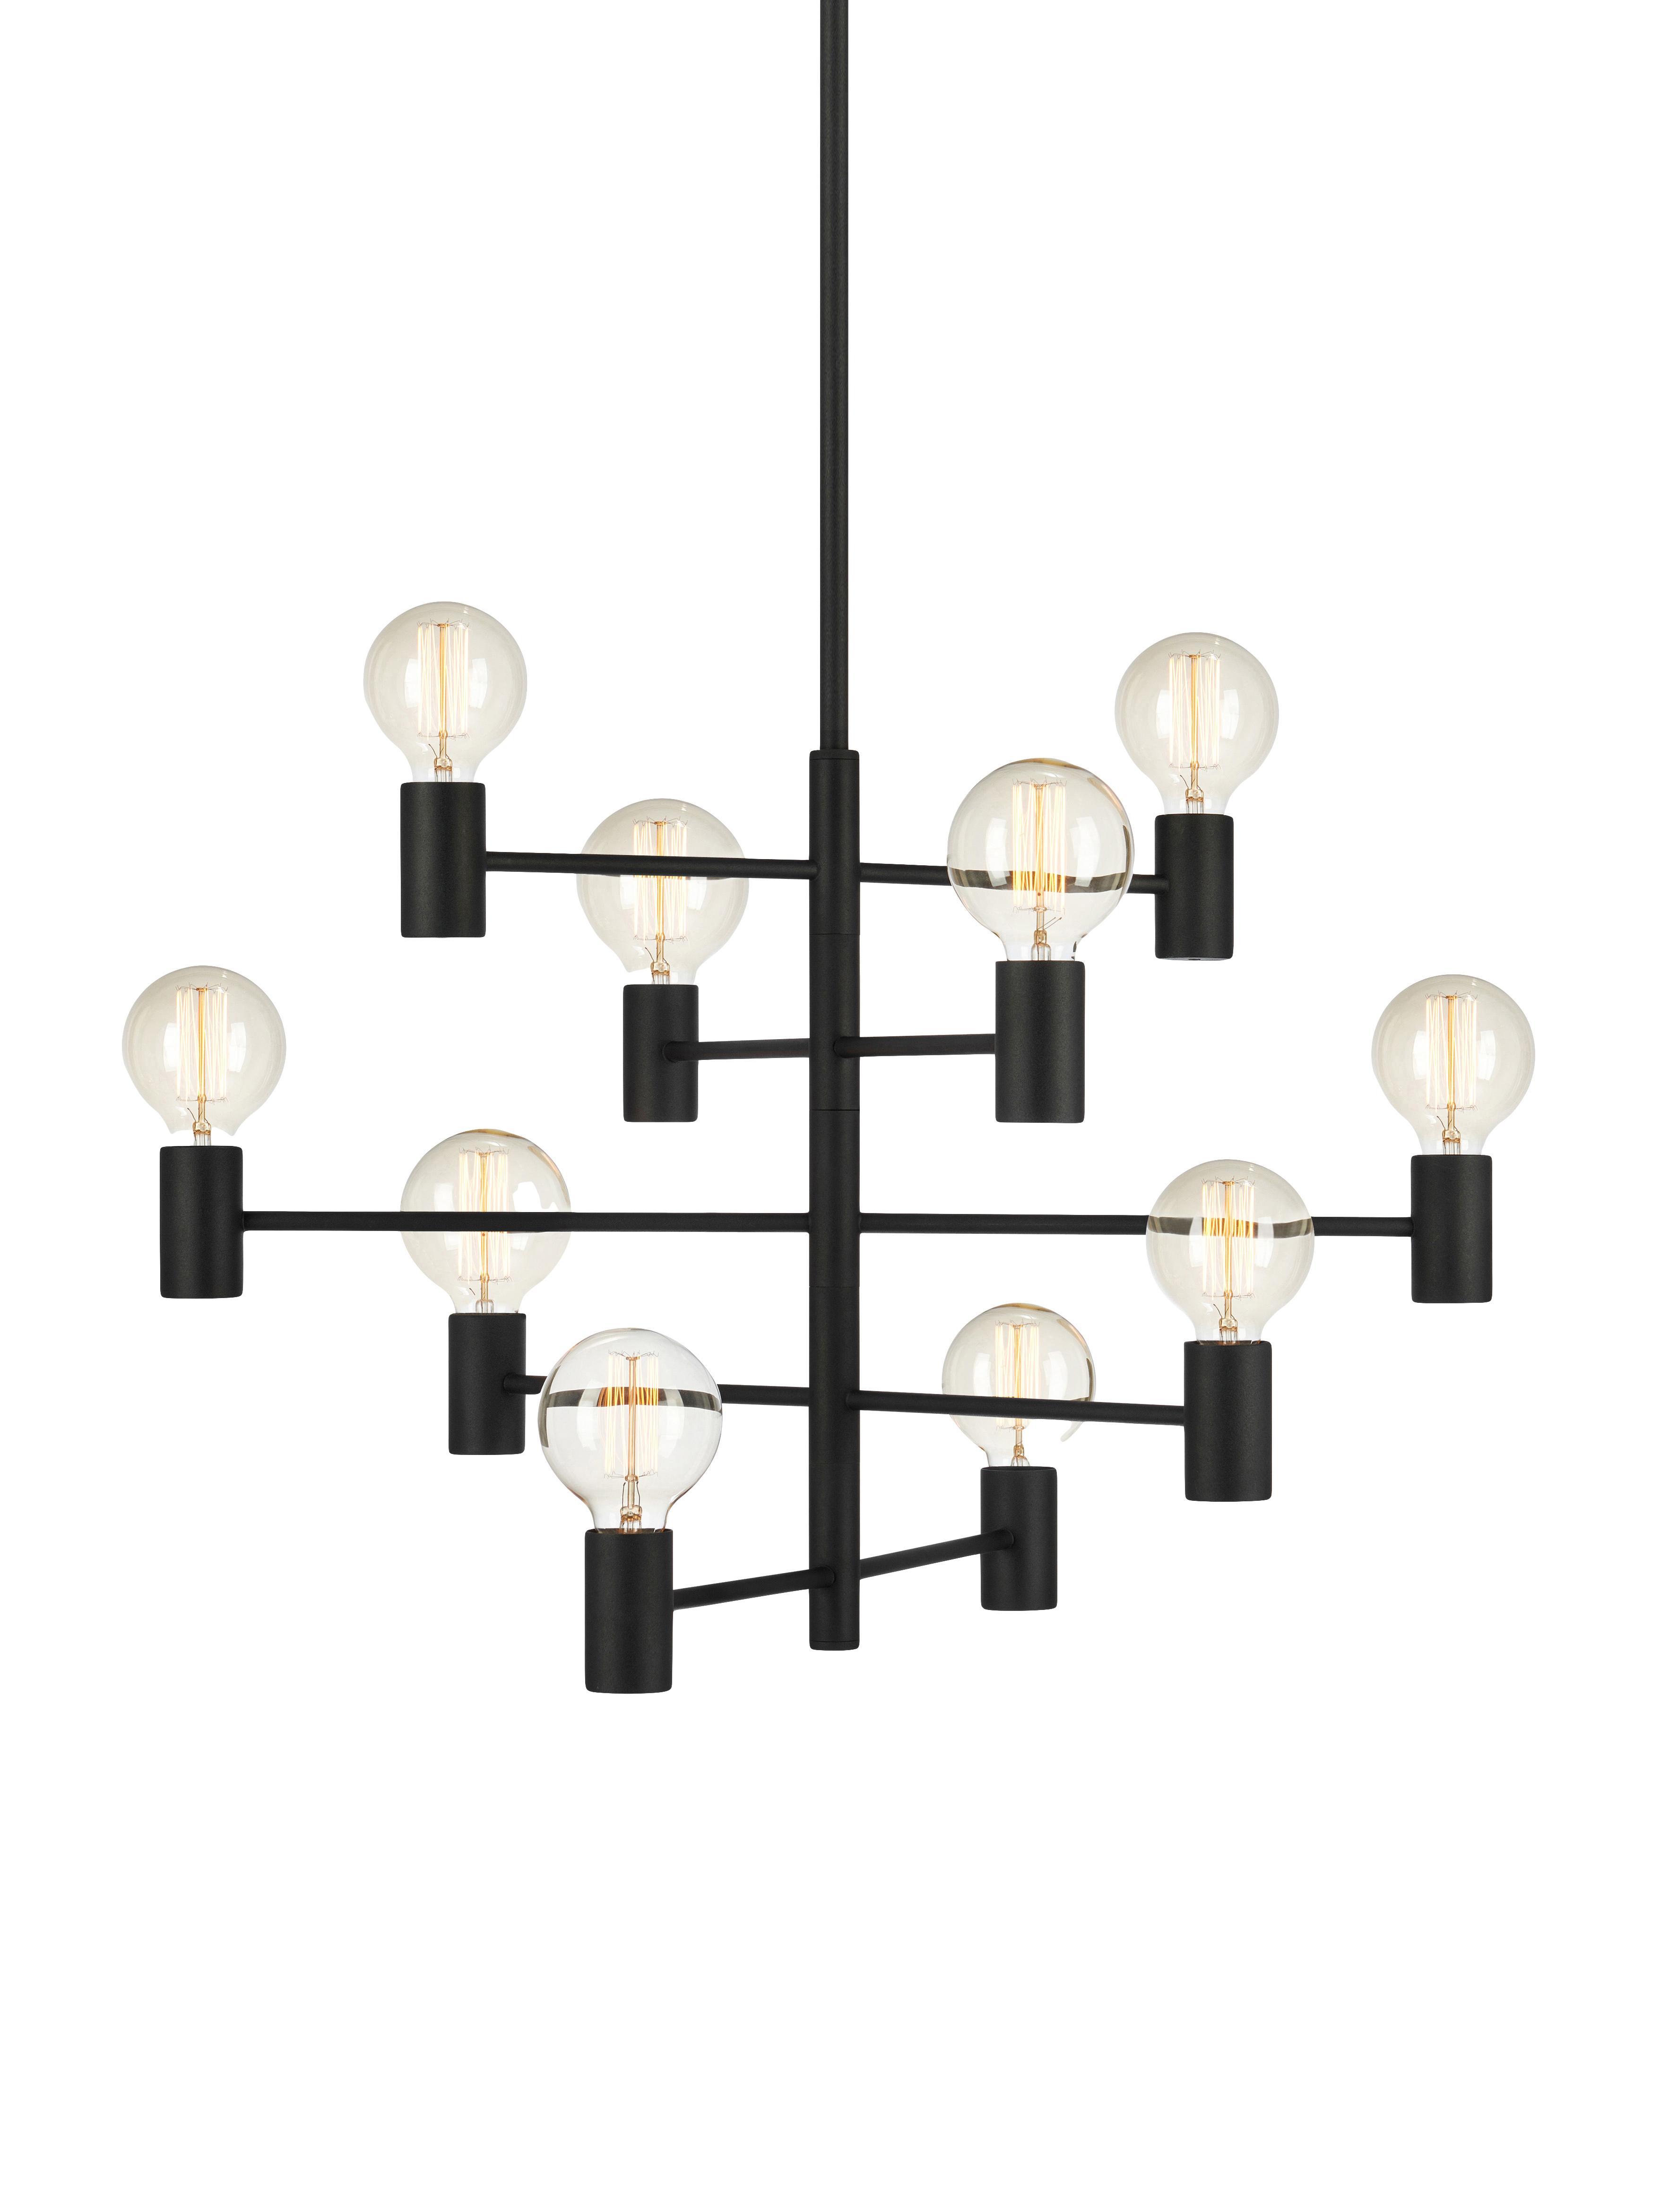 Lampada a sospensione regolabile Paris, Ottone verniciato, Lampada: nero Cavo: trasparente, Ø 80 x Alt. 49 cm